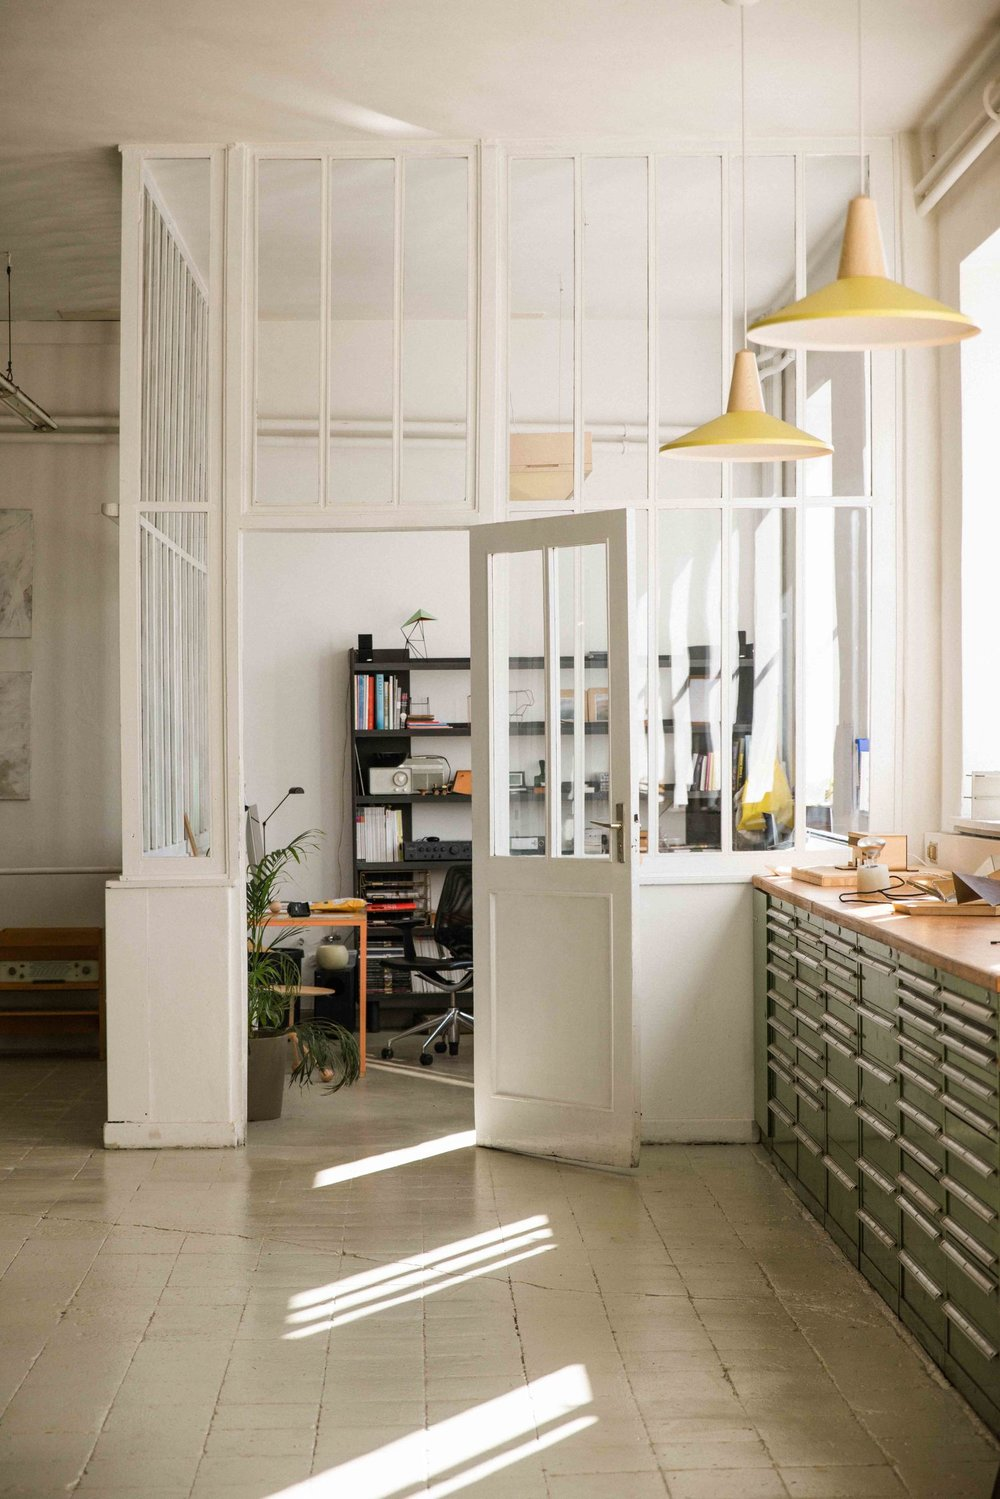 Design by  Schneid Lightings & Furniture